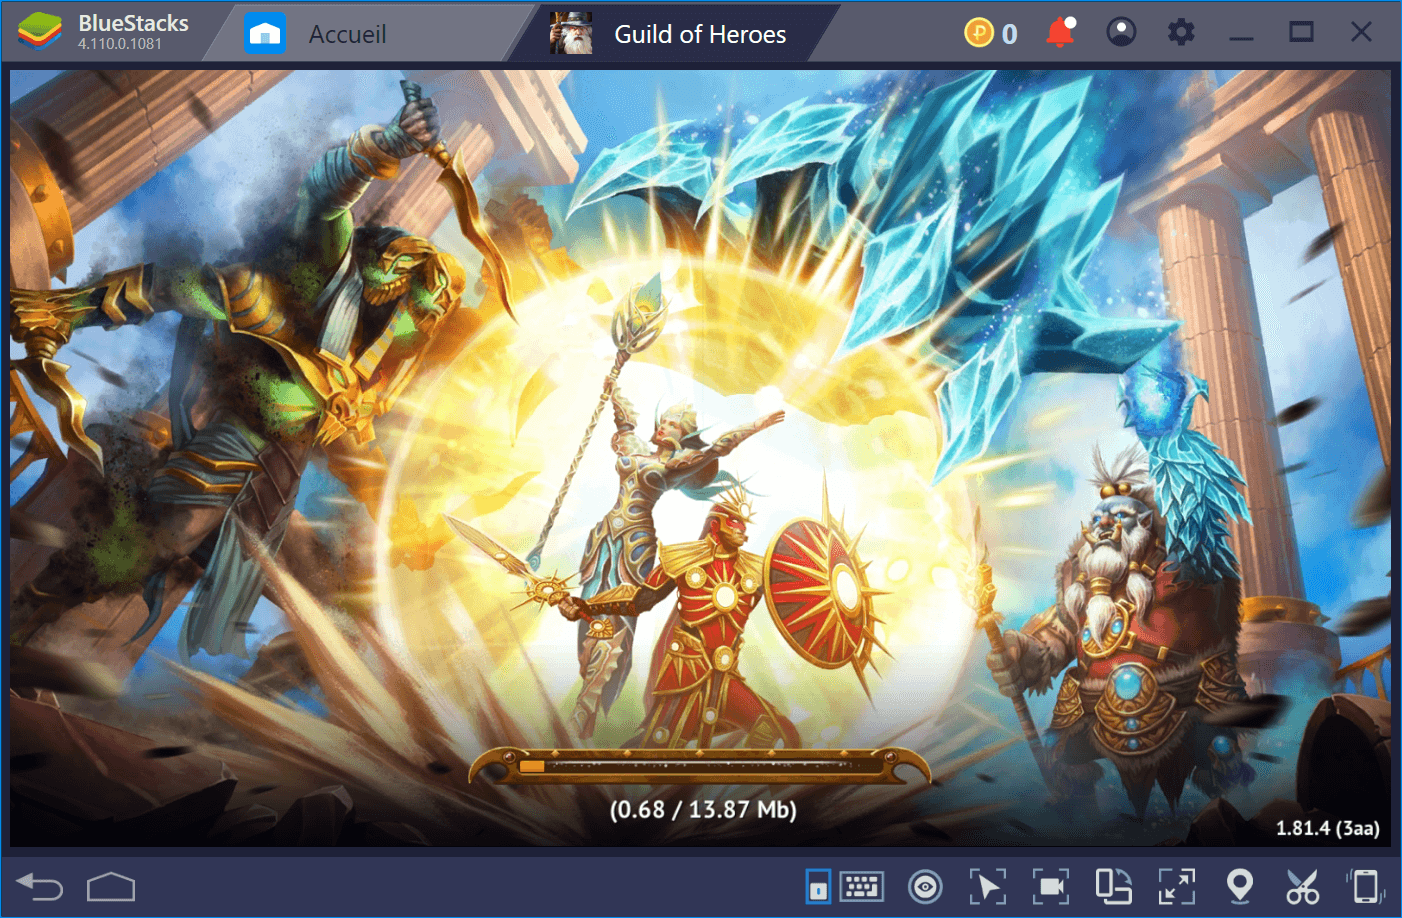 Bien débuter dans Guild of Heroes